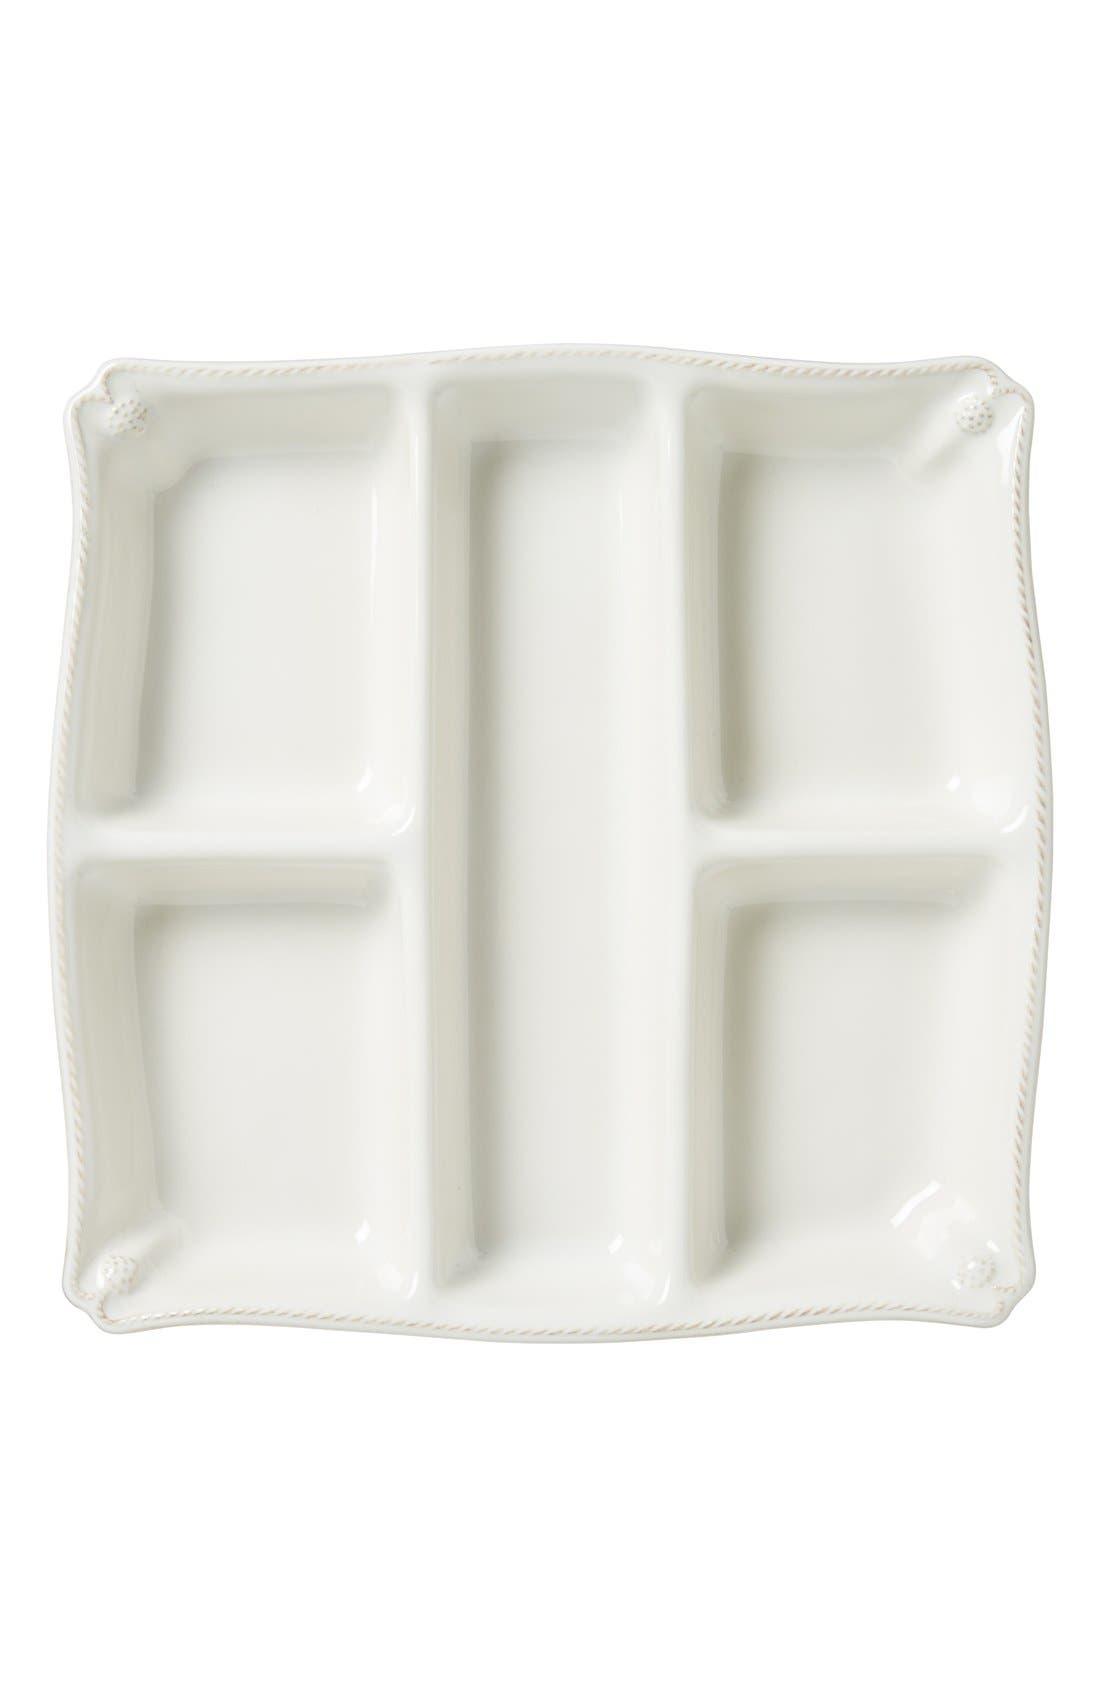 Main Image - Juliska'Berry and Thread' Ceramic Appetizer Platter